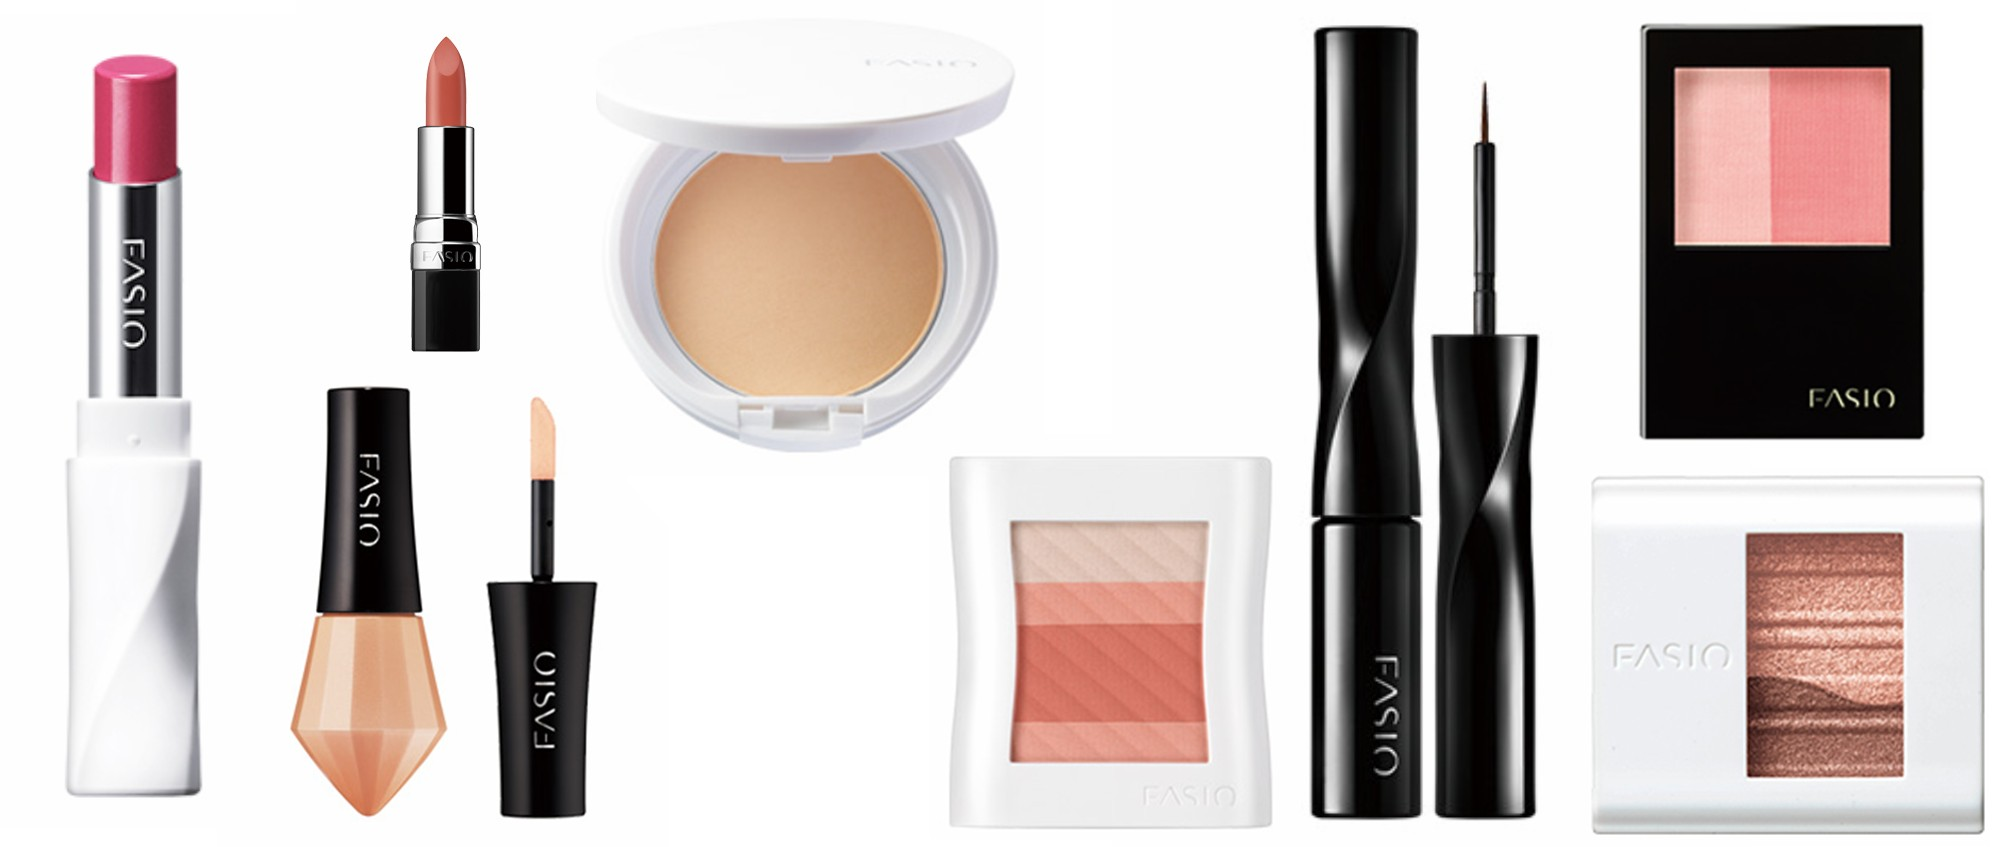 Fasio Makeup